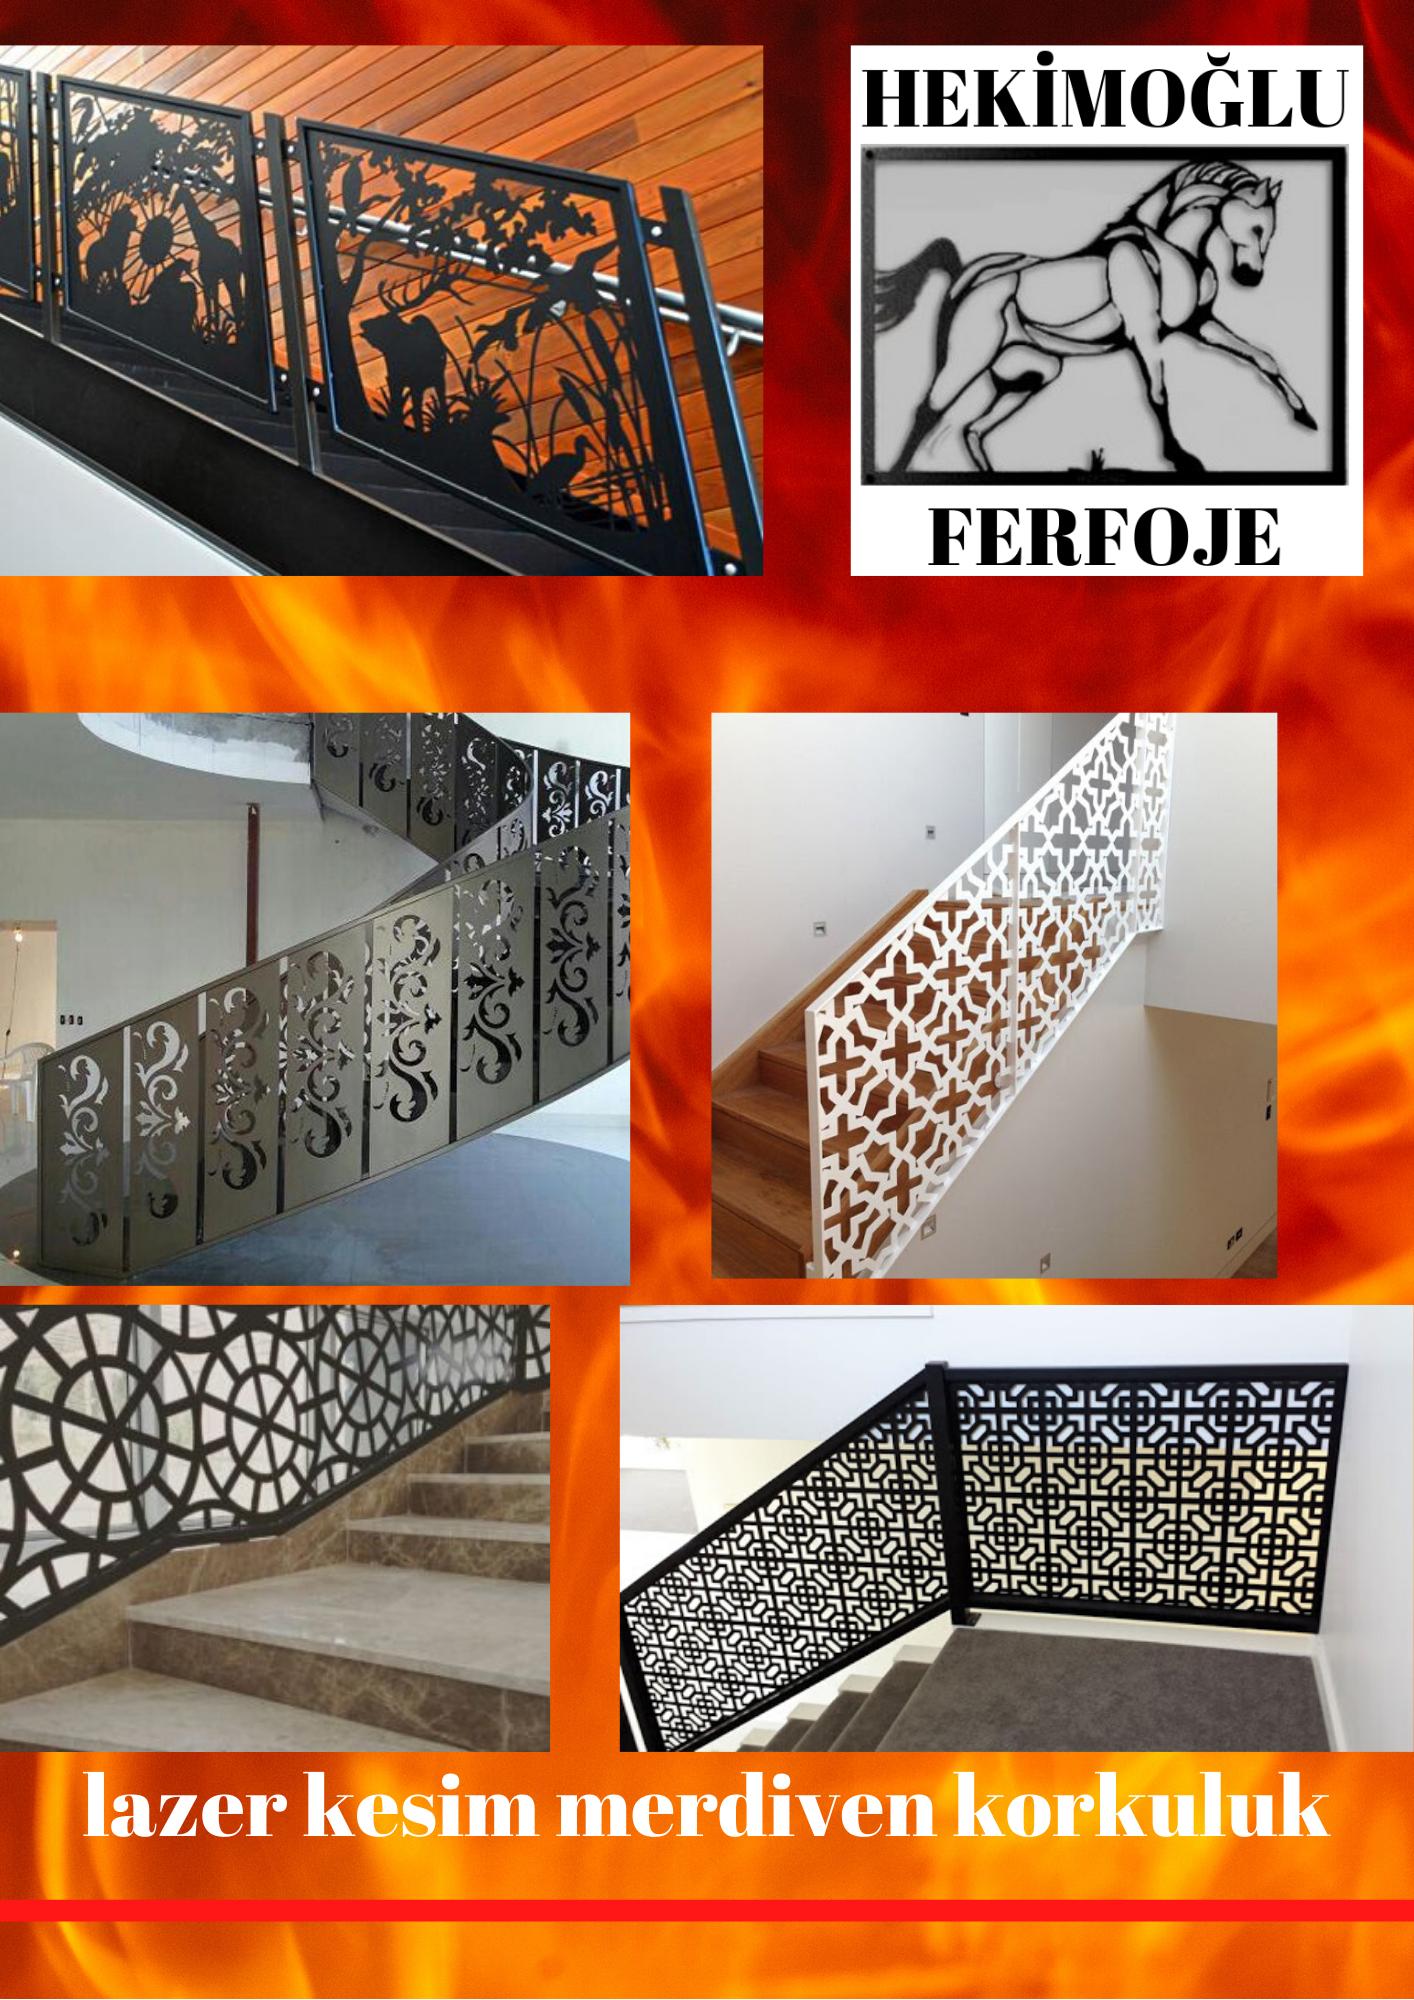 Lazer kesim merdiven korkuluk modelleri İzmir